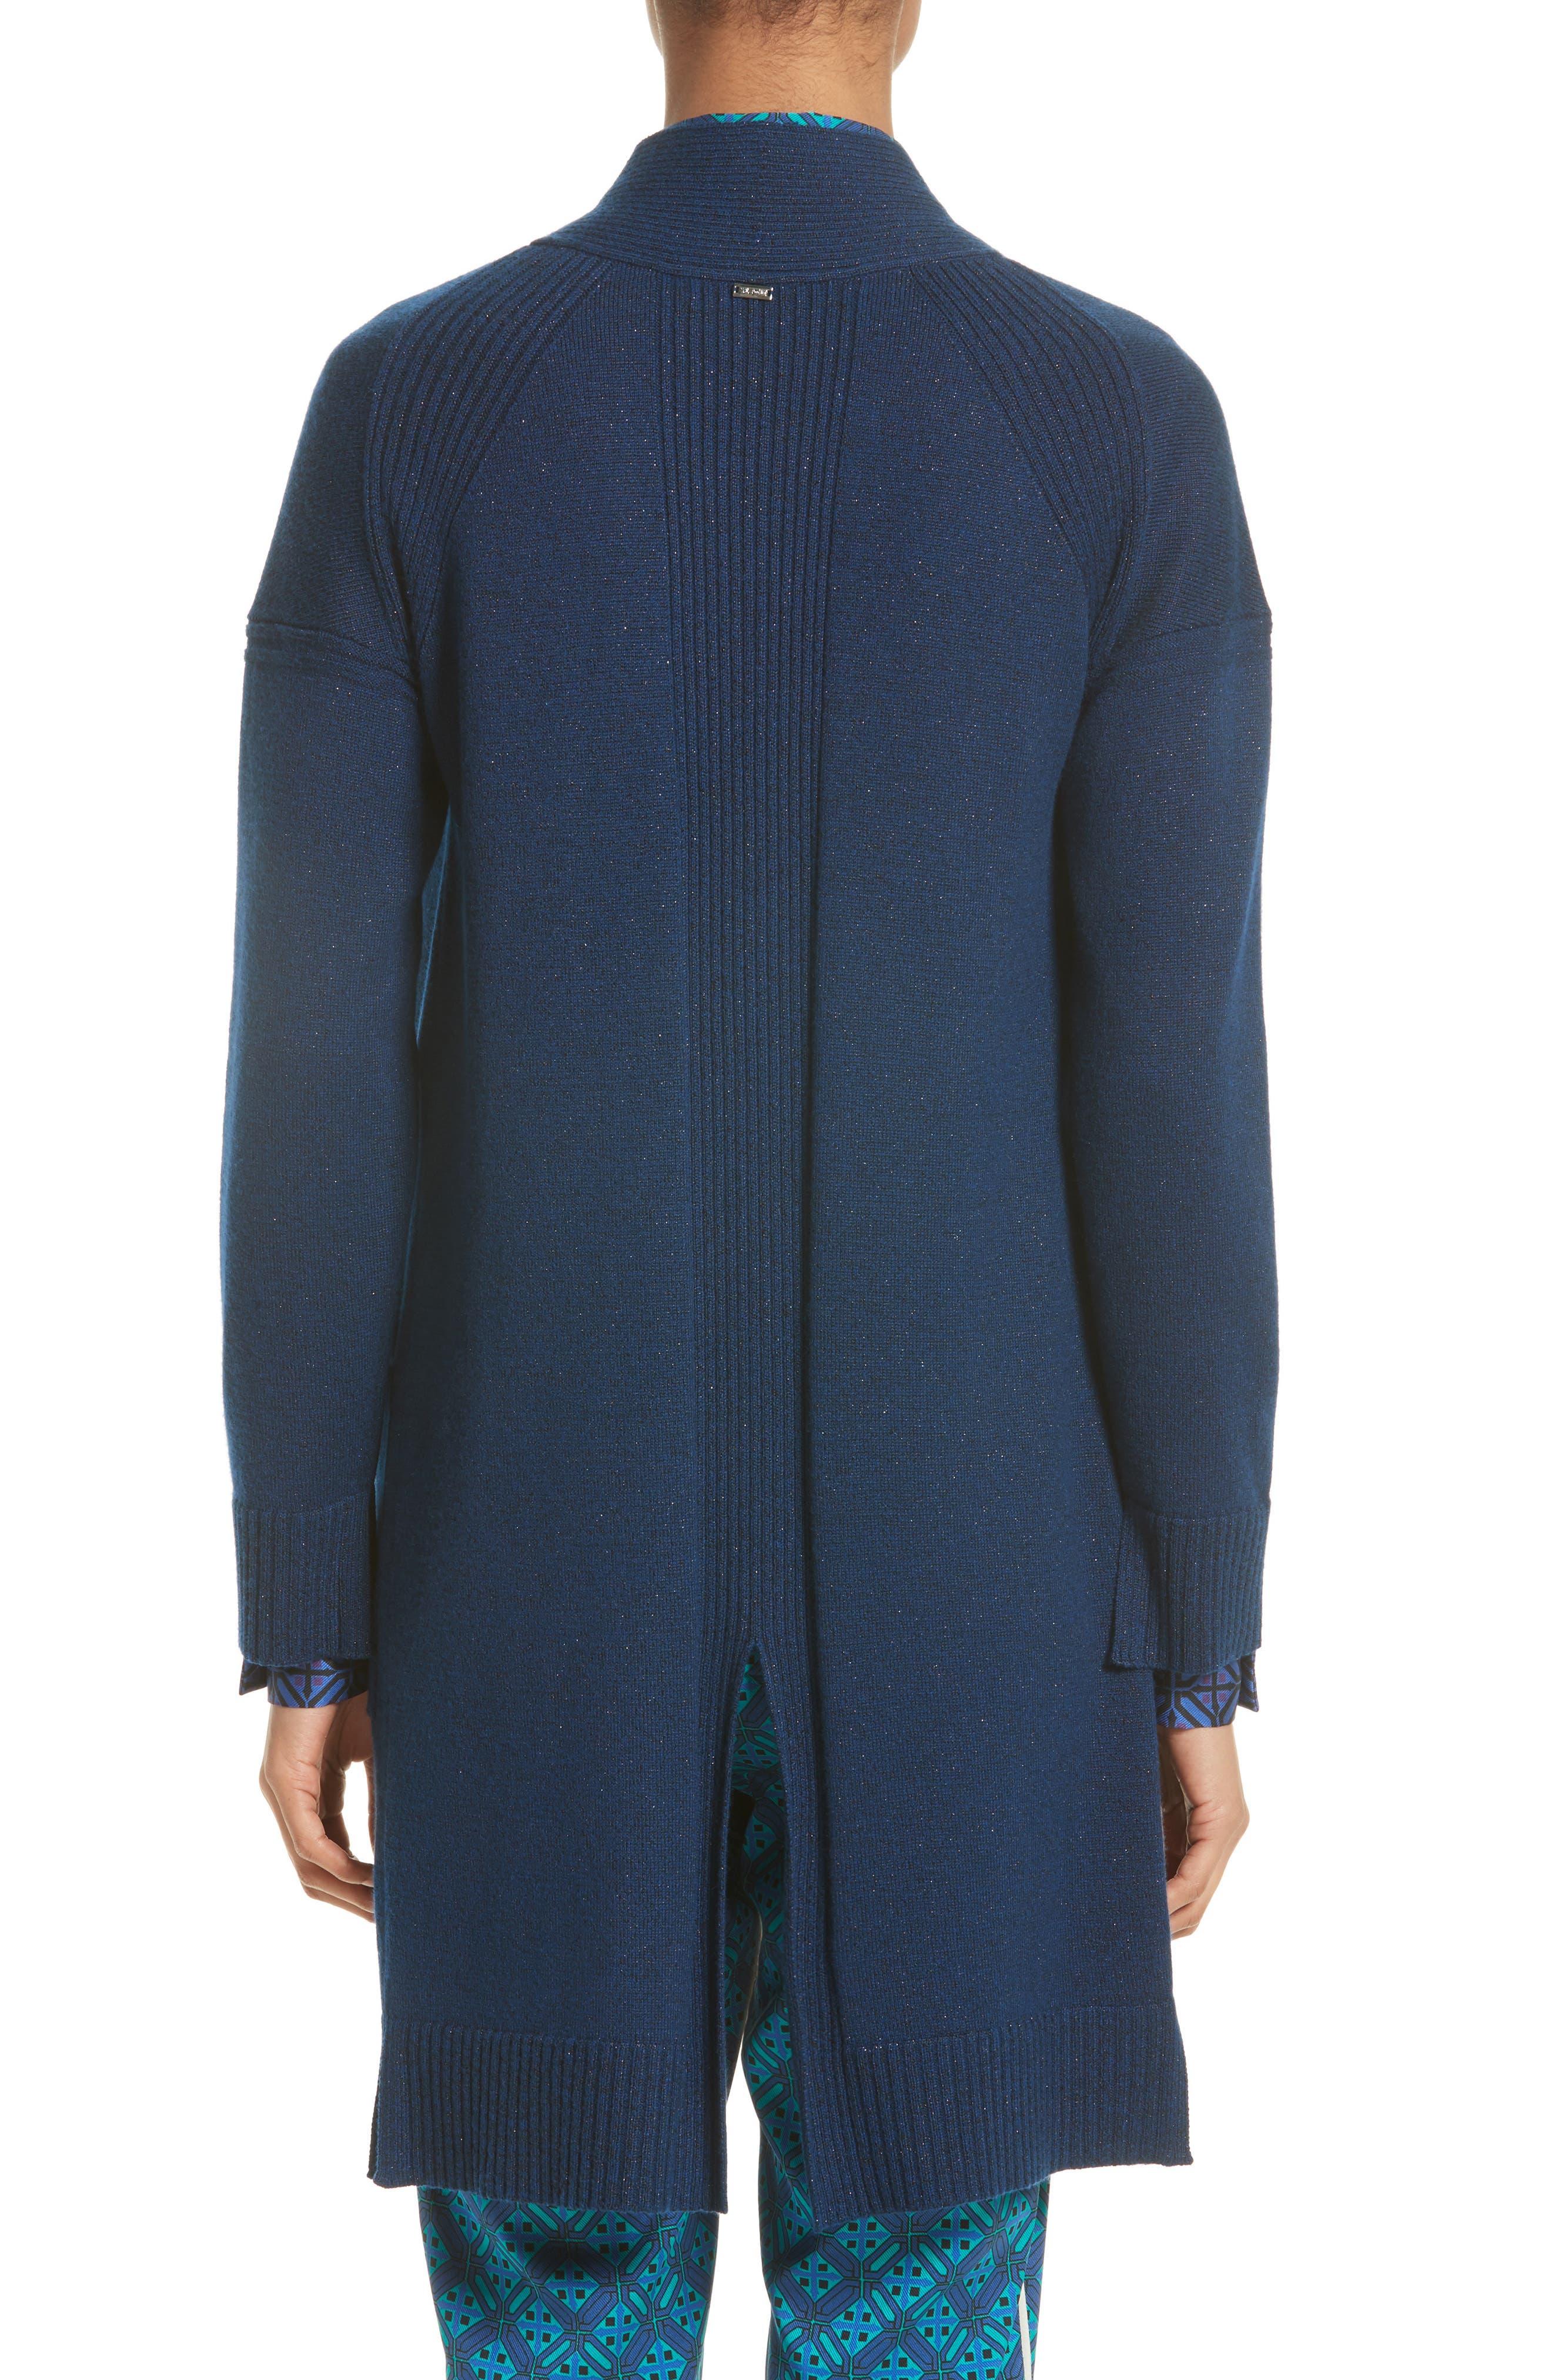 Jersey Cashmere Blend Sparkle Knit Jacket,                             Alternate thumbnail 2, color,                             410